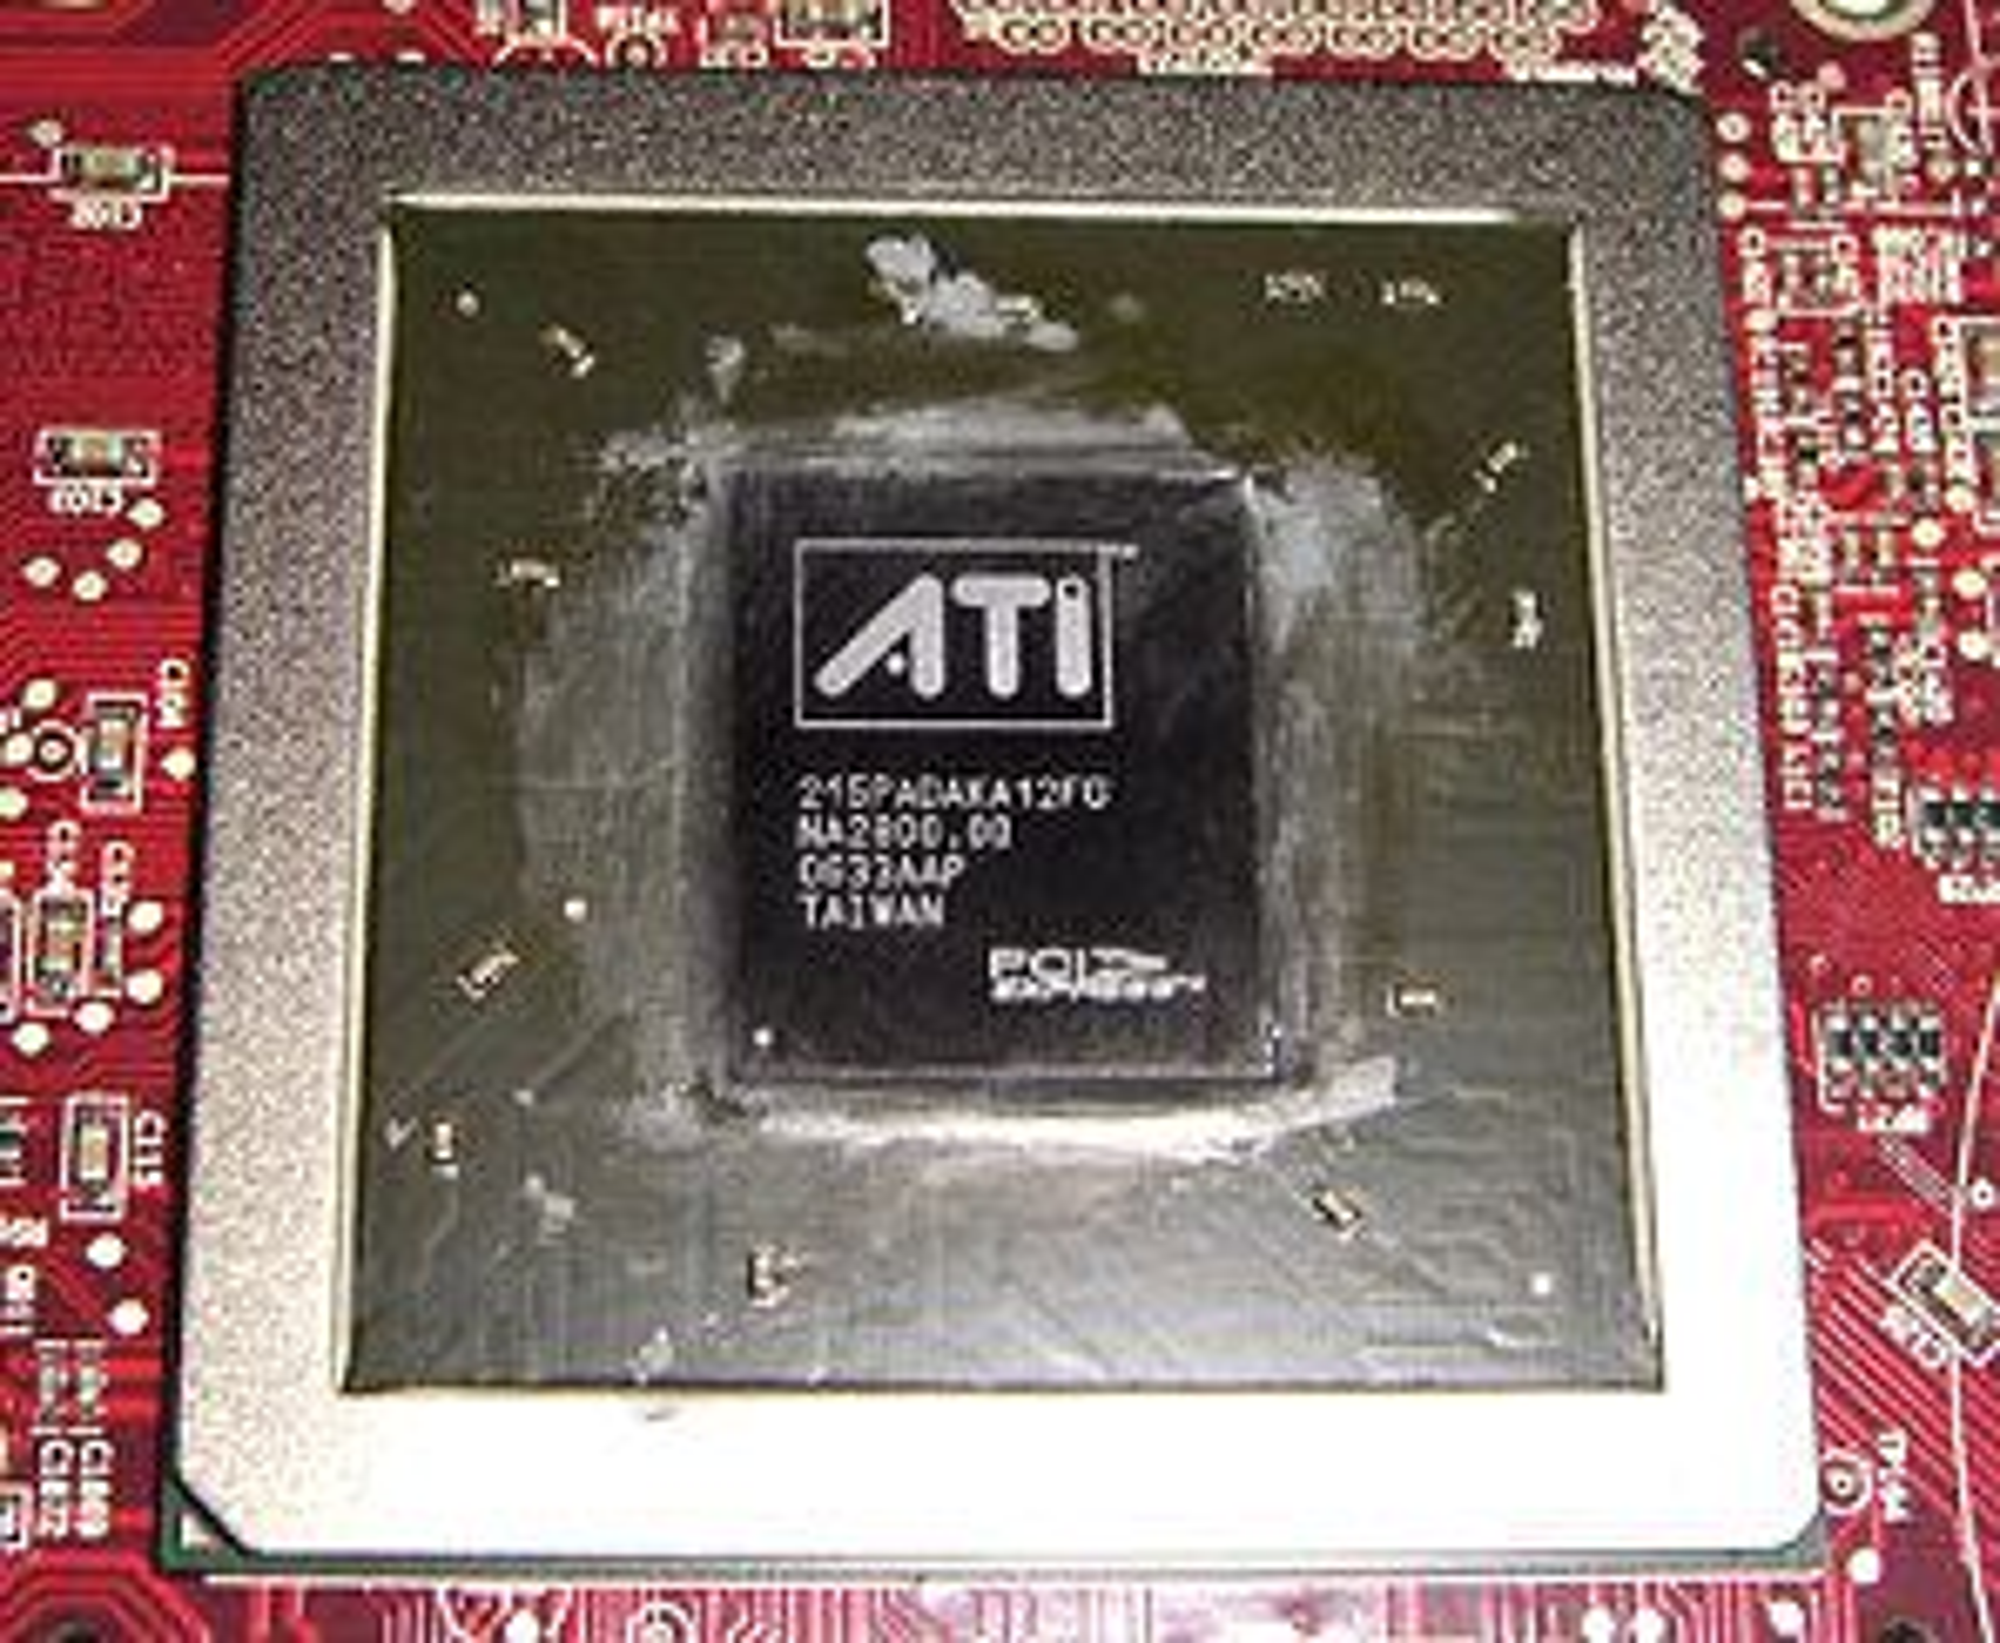 Radeon X1950 Pro får snart en avløser